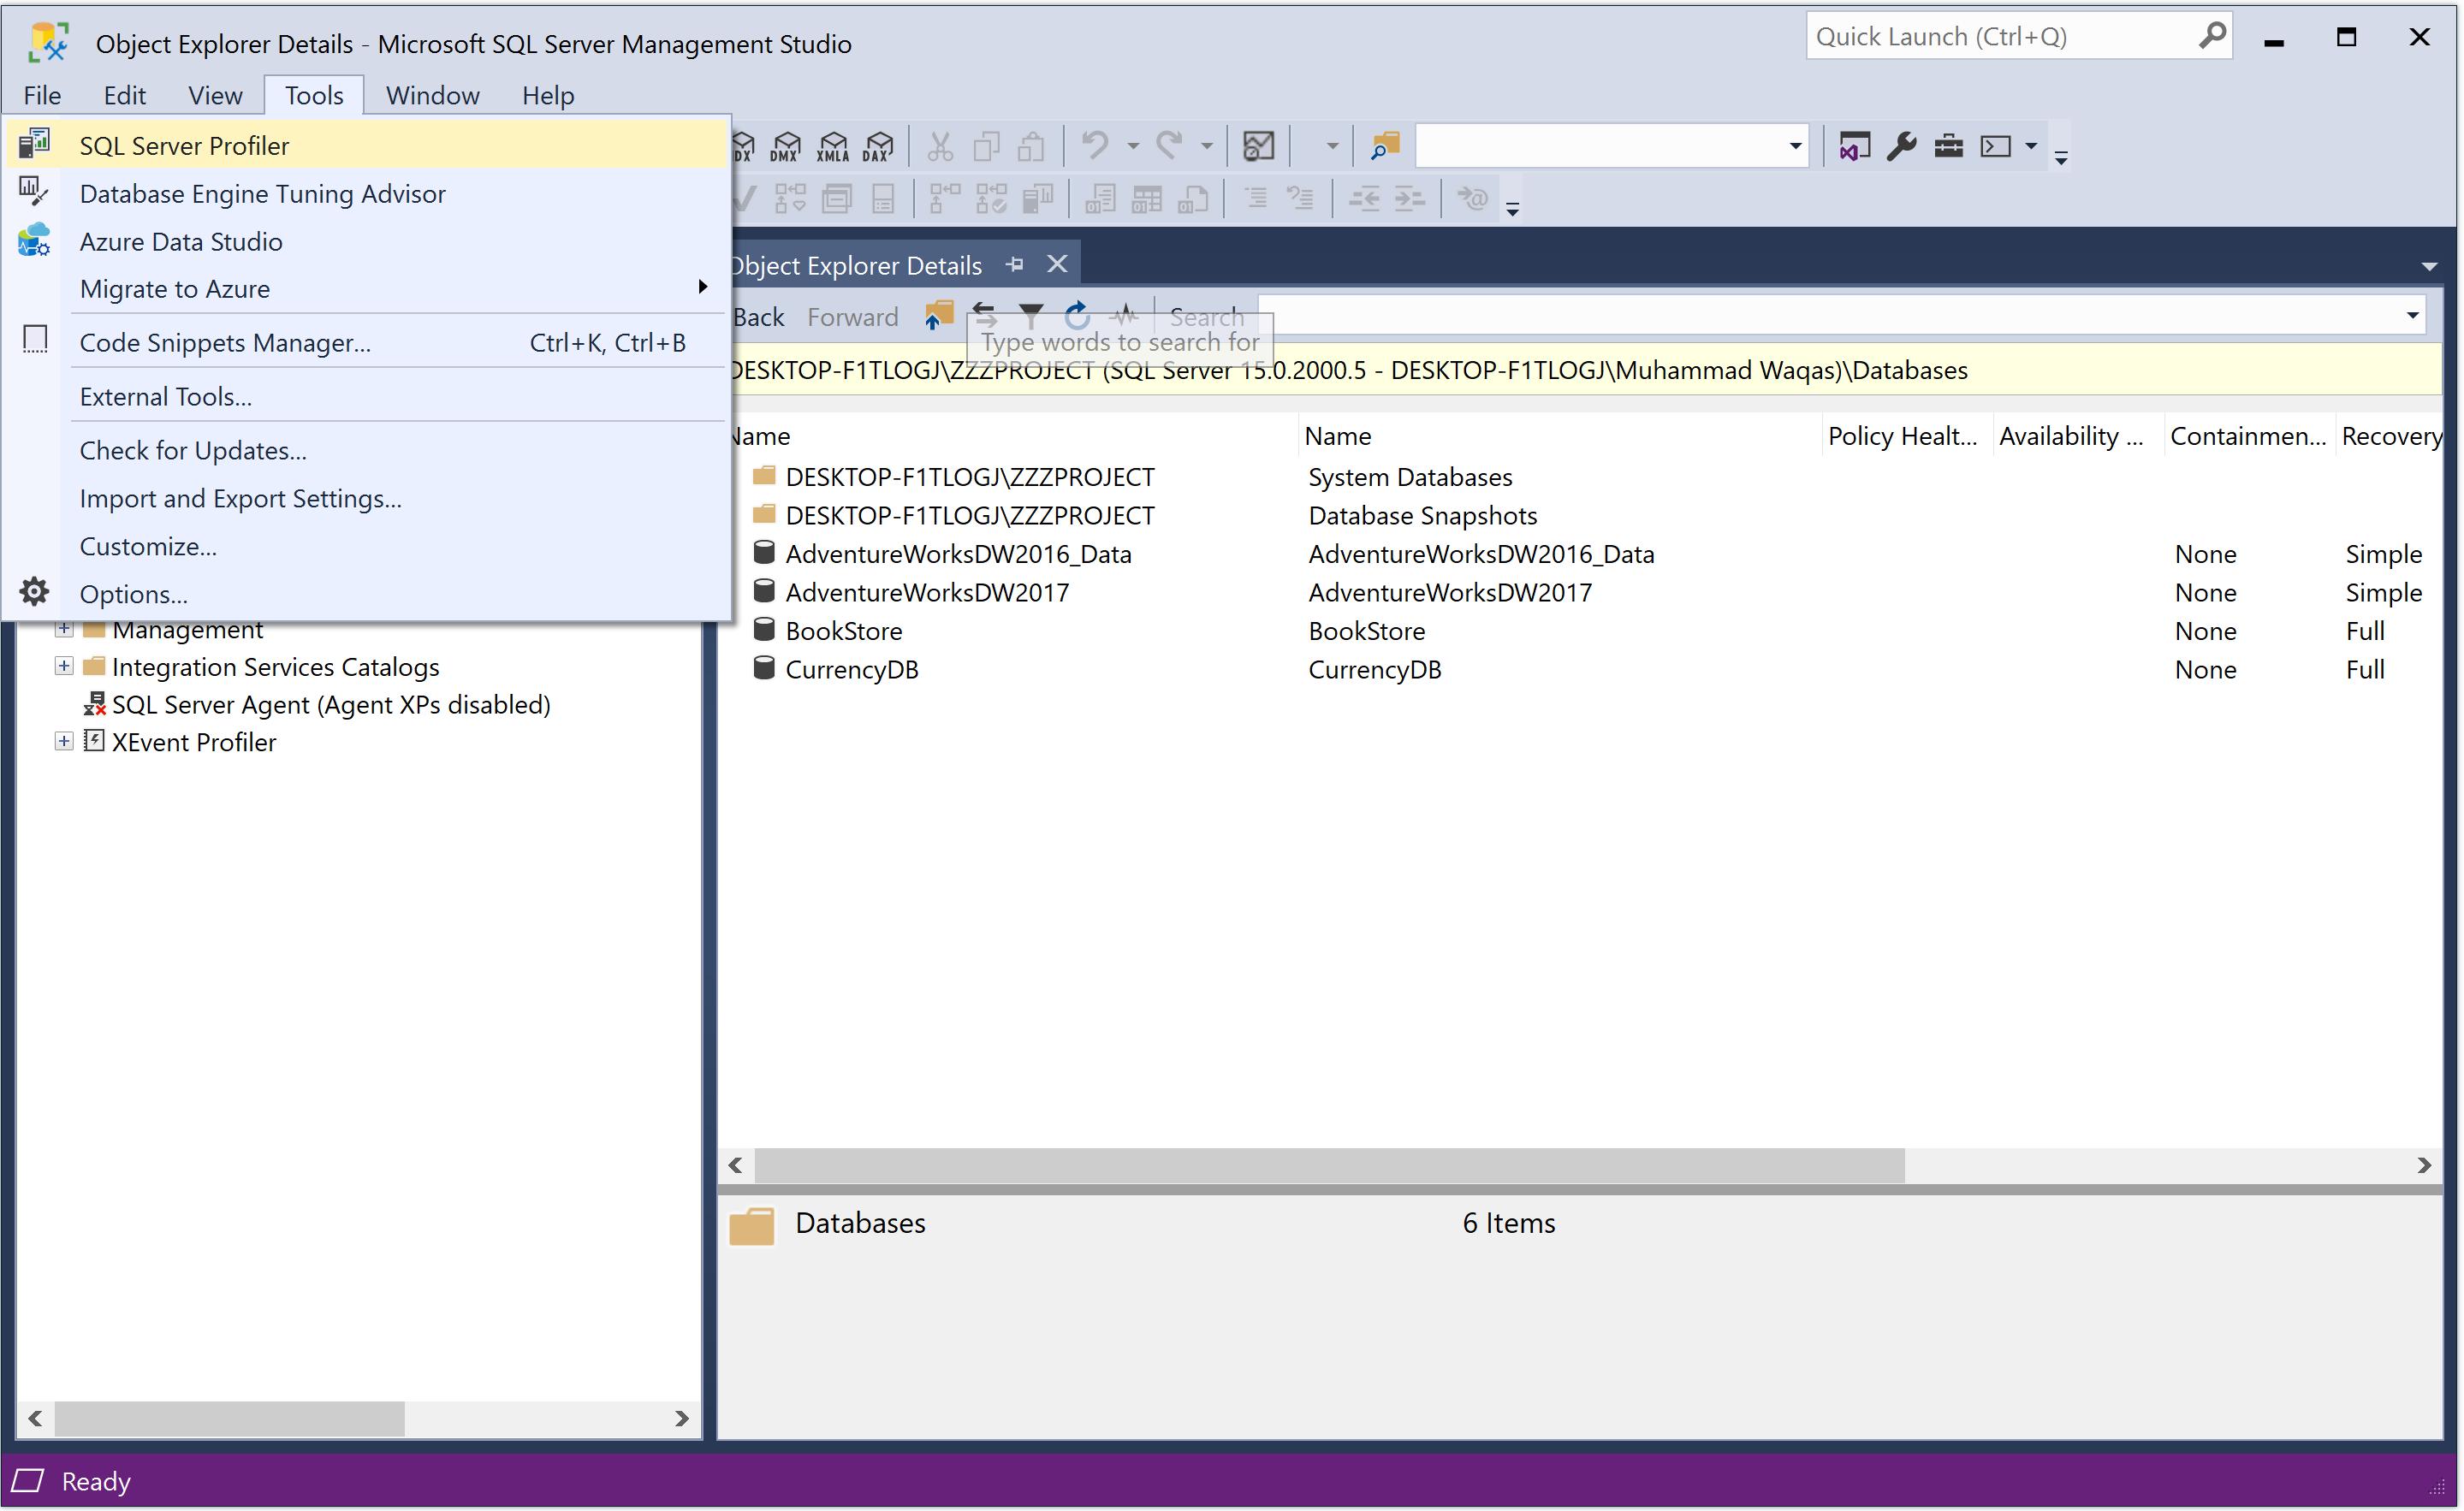 Launch SQL Server Profiler from SSMS